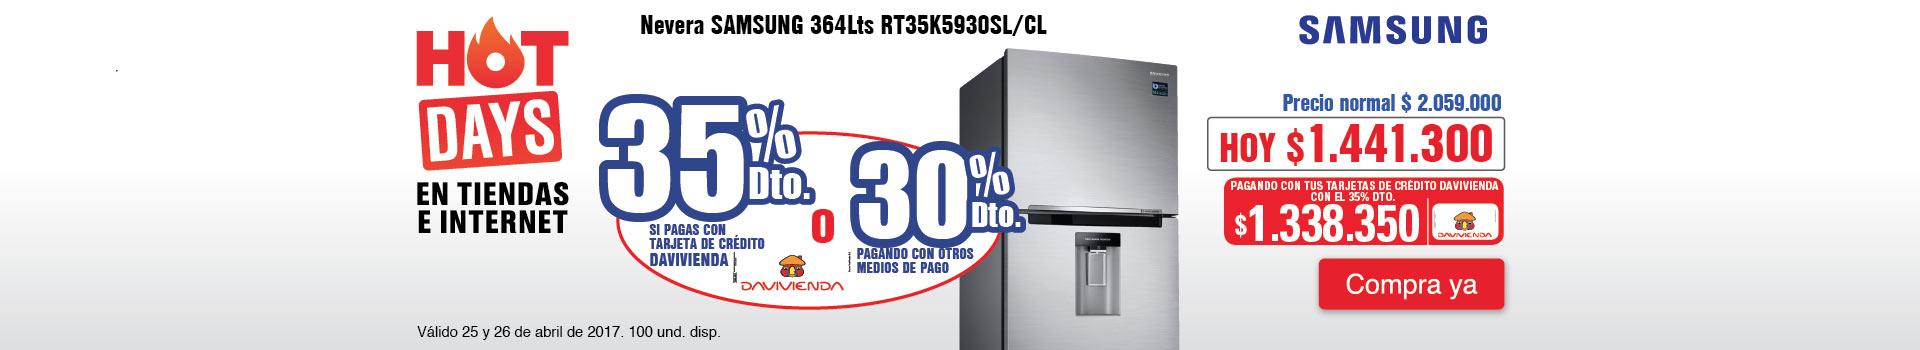 CAT ELECT - abril 25 - HOT SALE - Nevera SAMSUNG 364Lts RT35K5930SL/CL